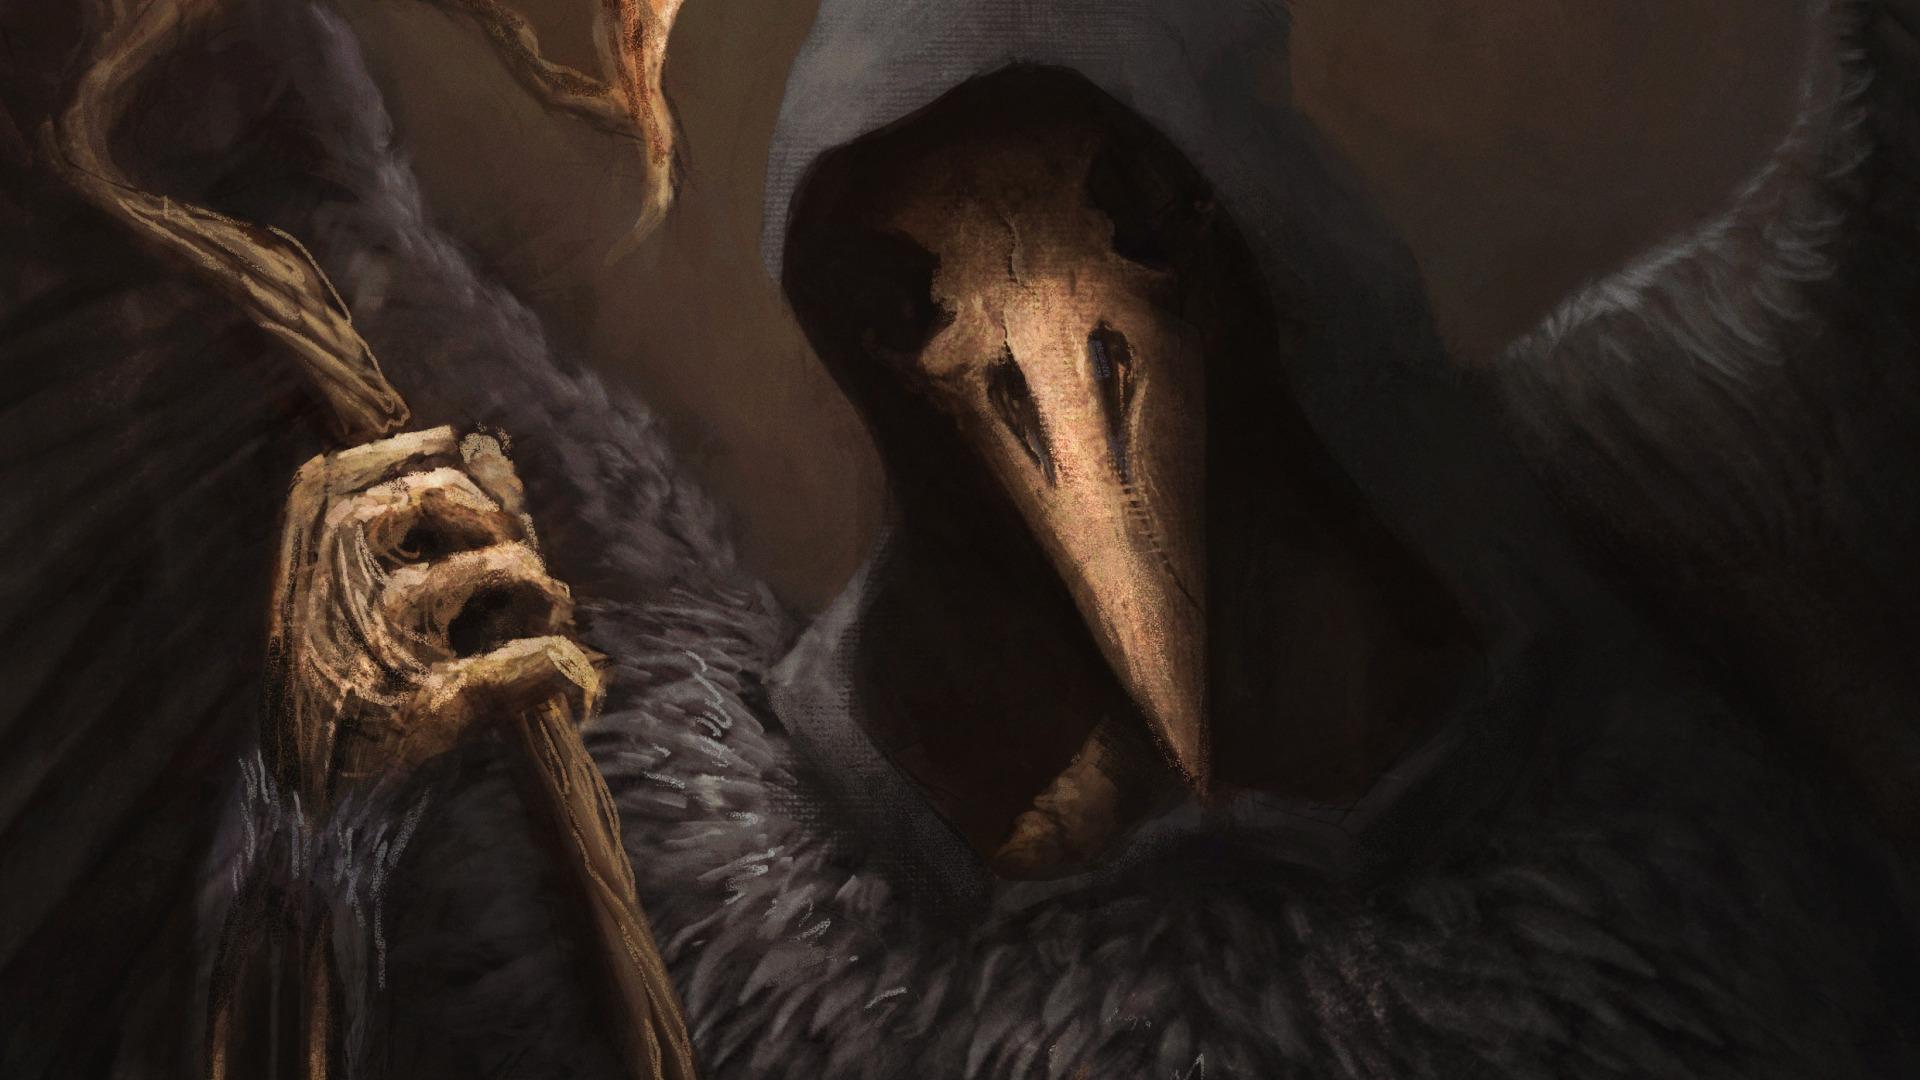 General 1920x1080 fantasy art digital art artwork face Grim Reaper skull wings hoods raven Marcin Tyrakowski plague doctors